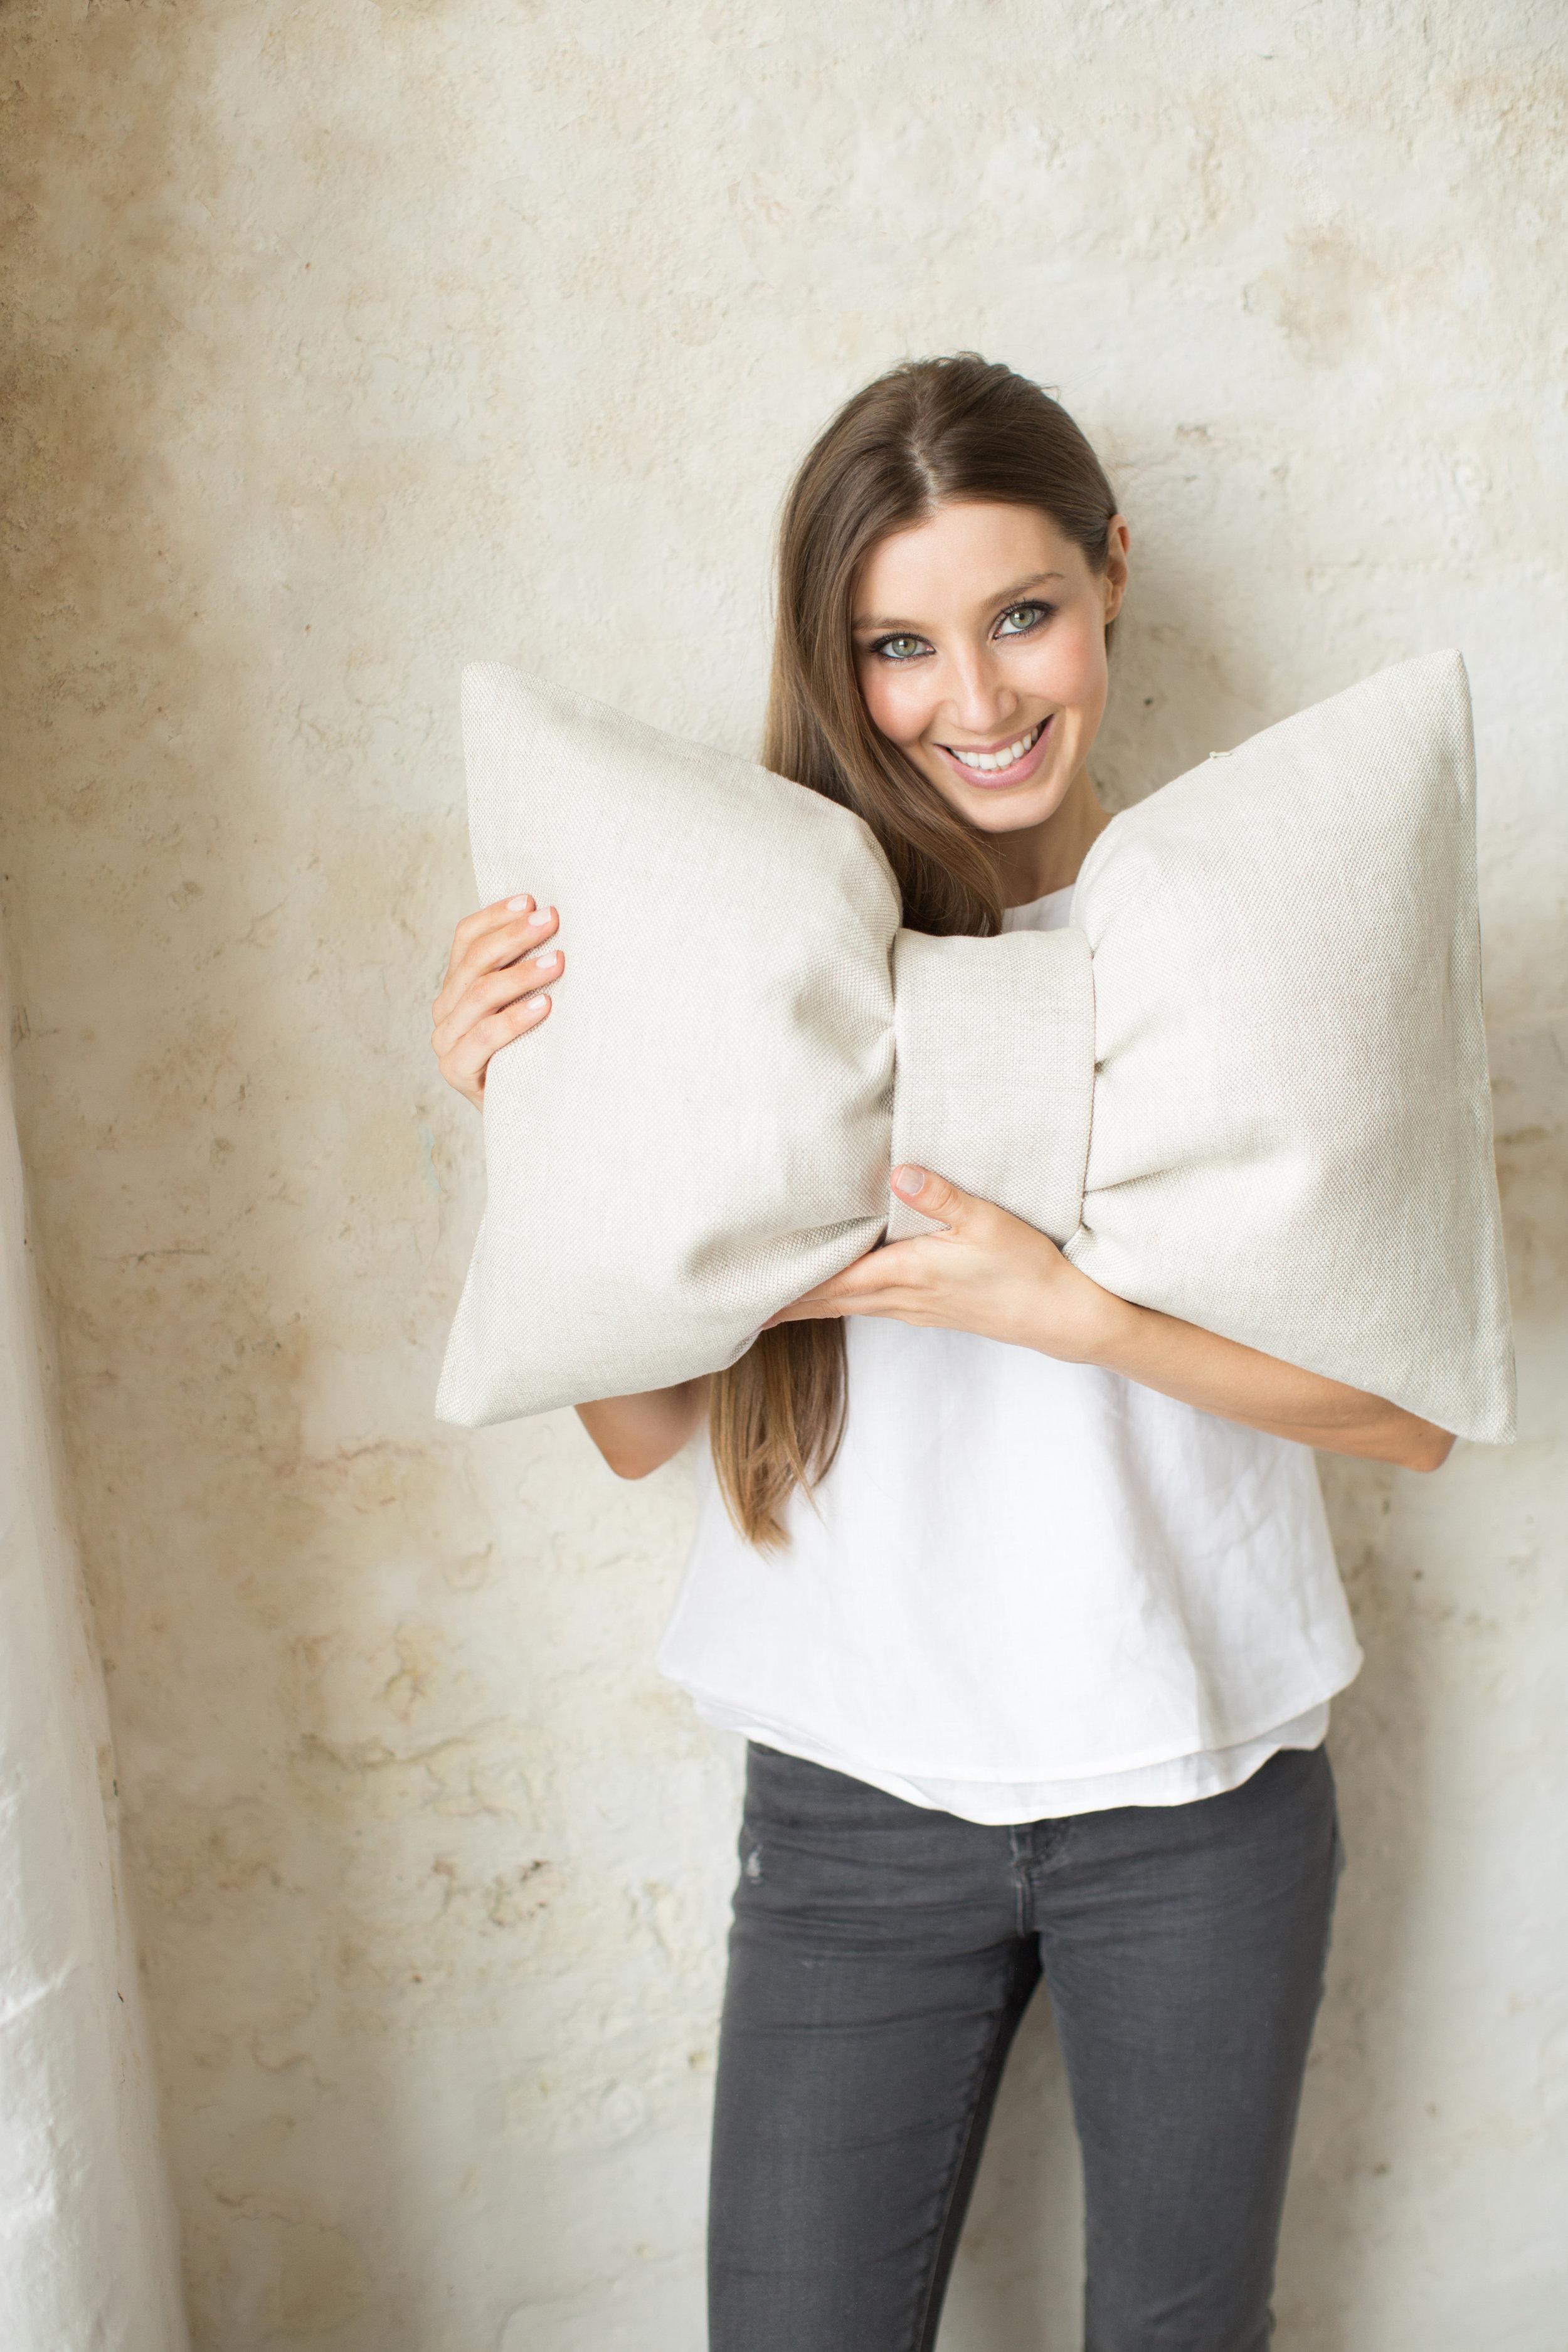 Irish Designer-Maker Katie Larmour of Katie Larmour Design, Luxury Irish Linen Brand, Award winning signature 'Bow' cushion photographed at Conway Mill Belfast.jpg